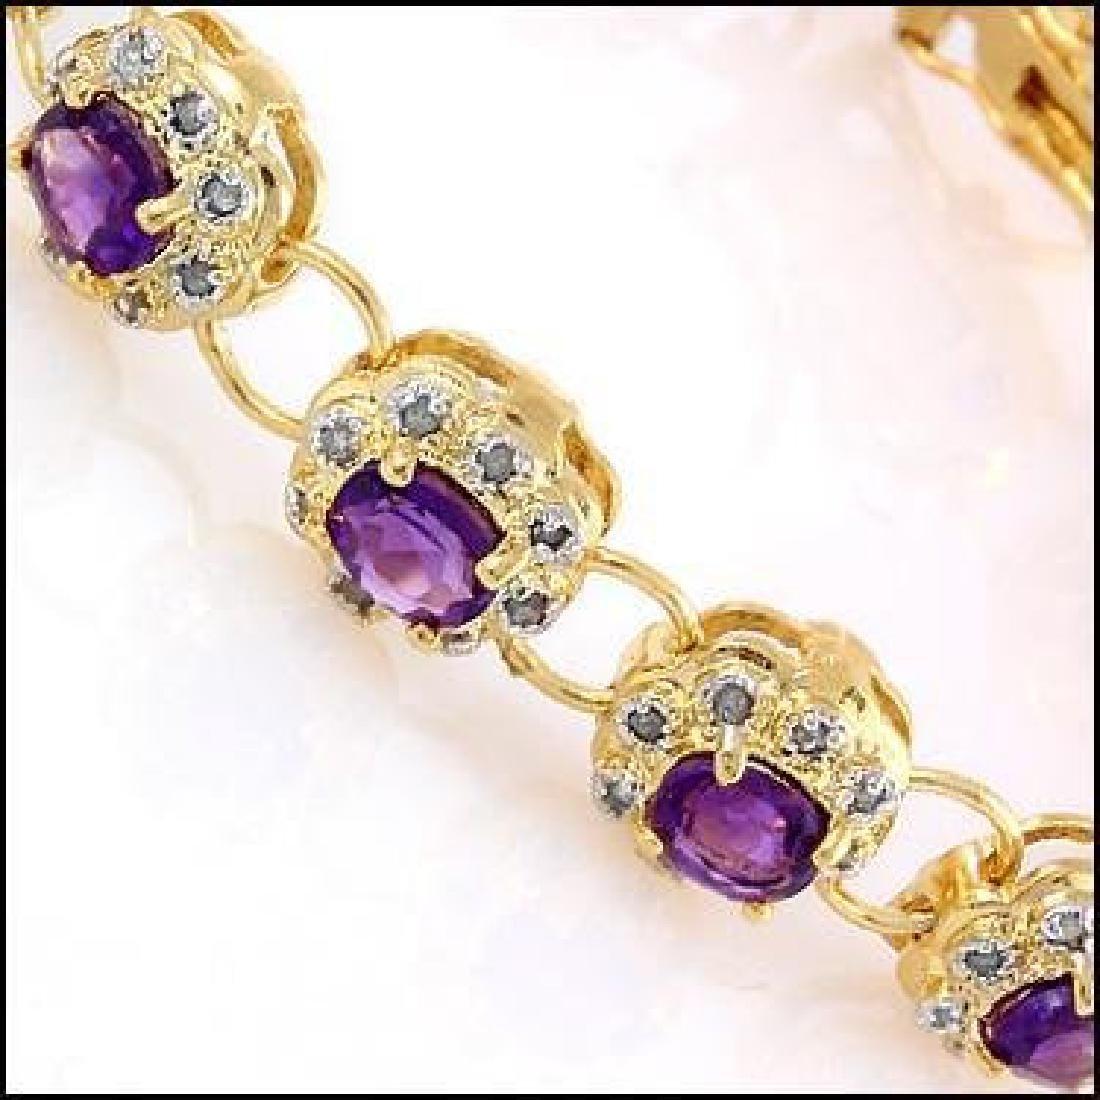 15.55 Ct Amethyst & Diamond Designer Bracelet $1,390 - 2